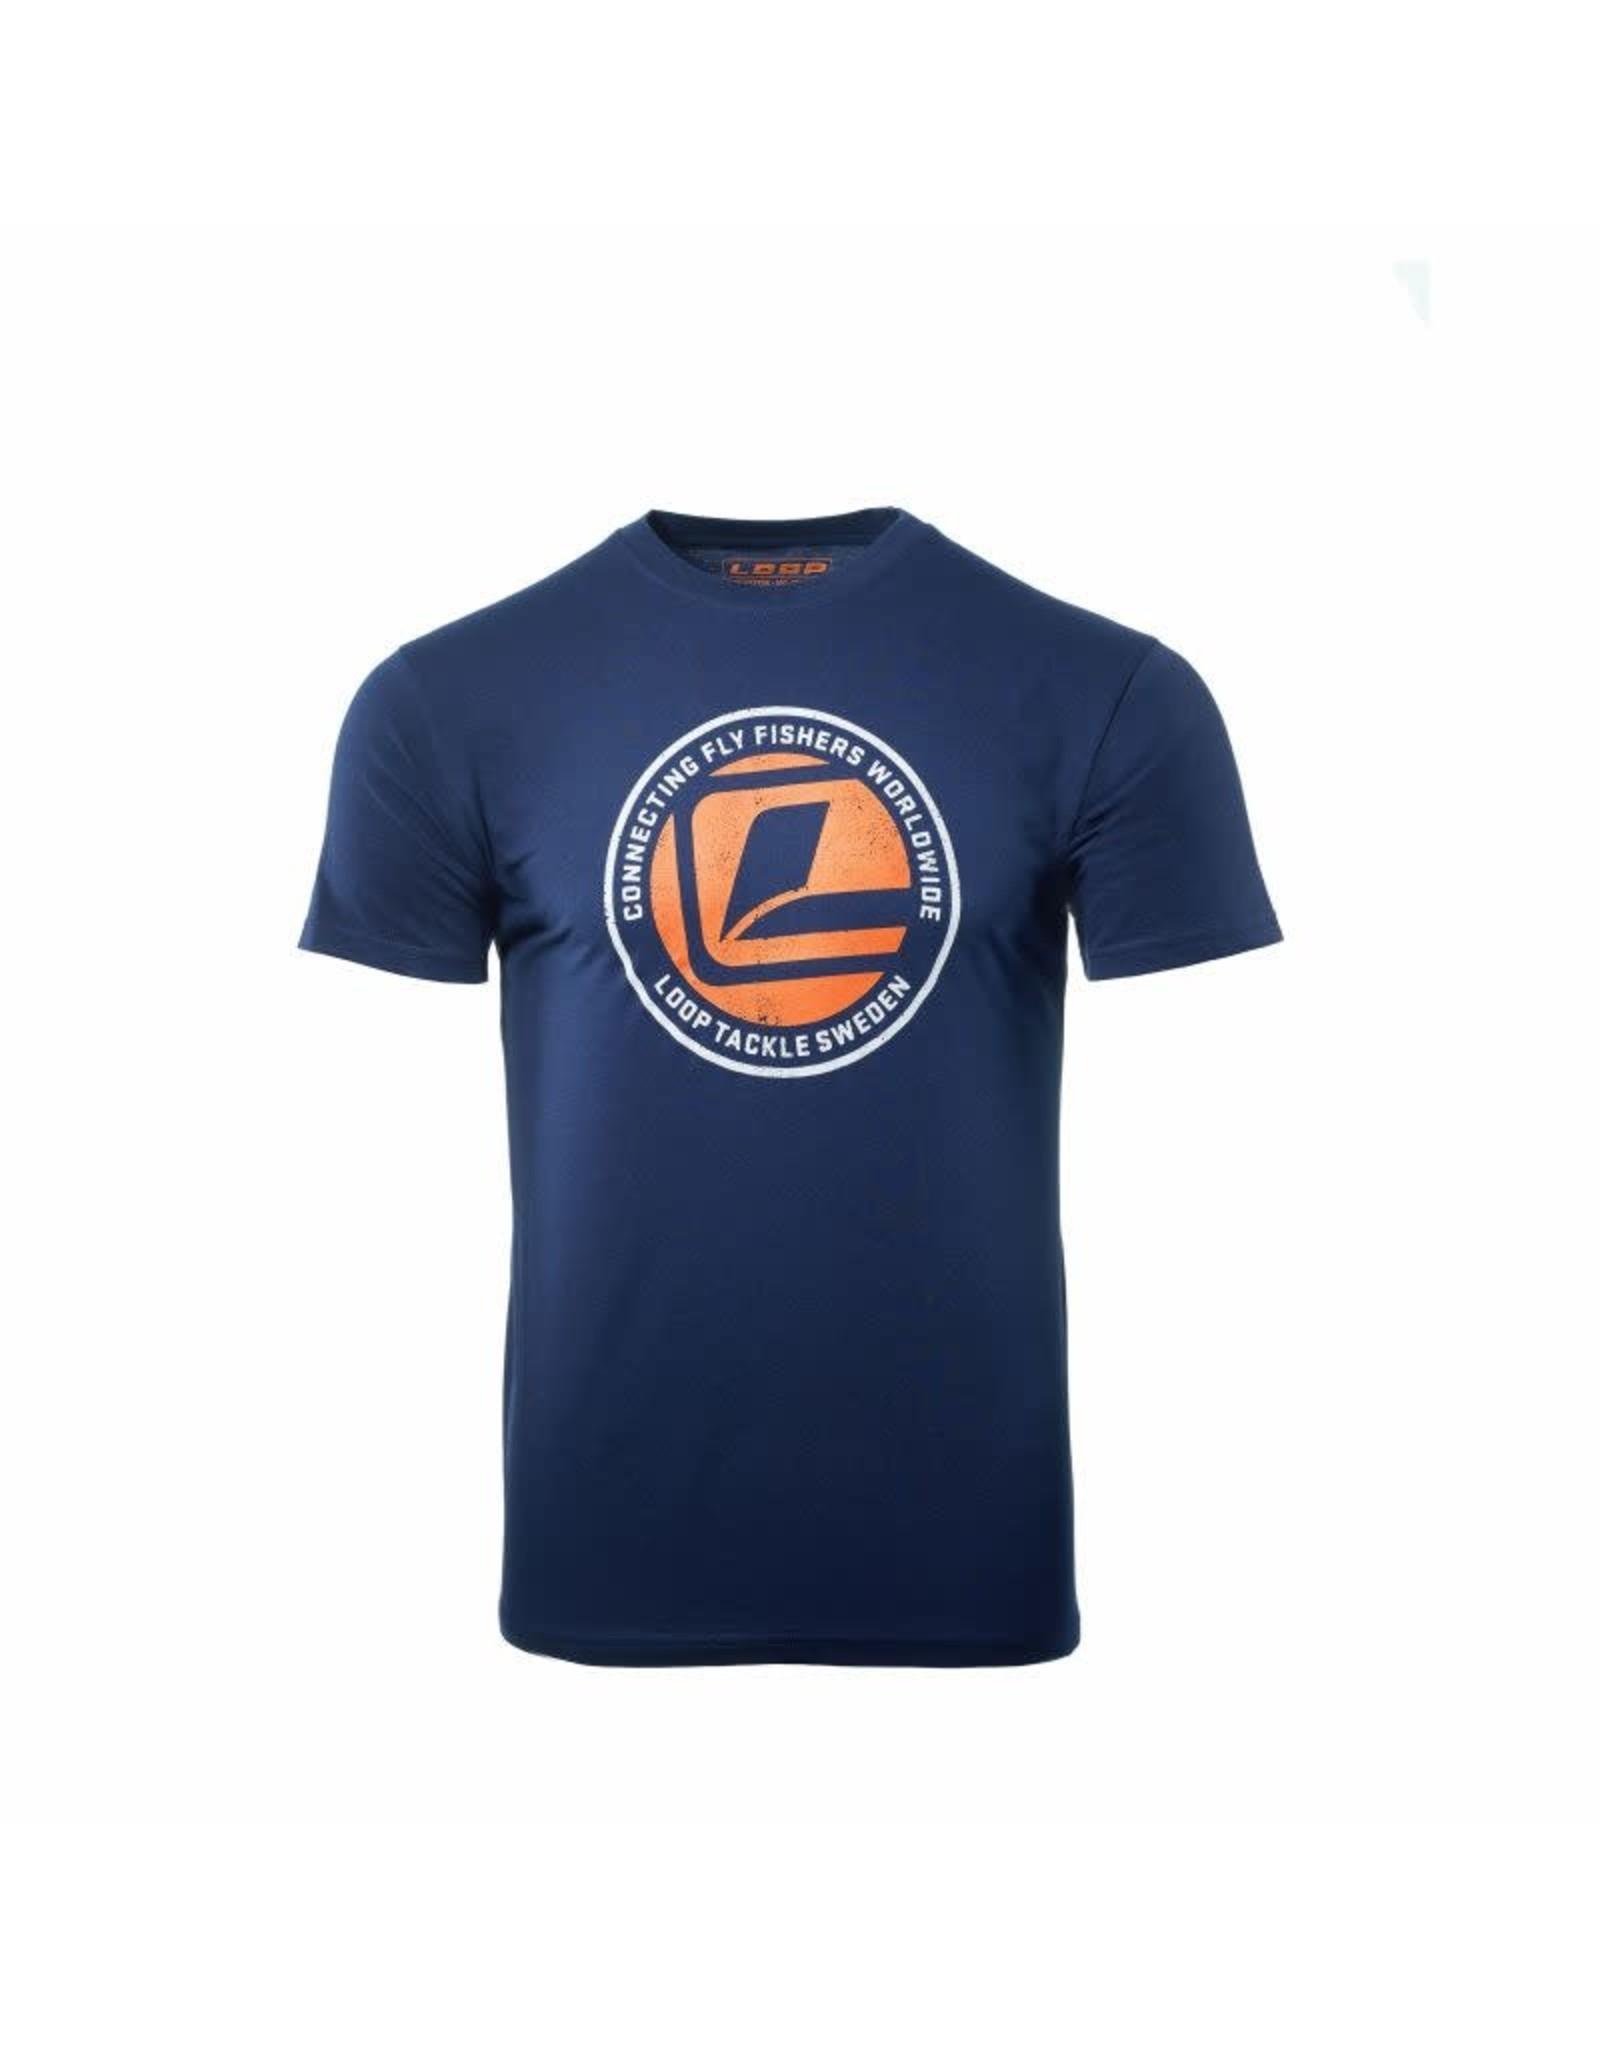 LOOP Connecting L Logo T-Shirt Navy - 2XL